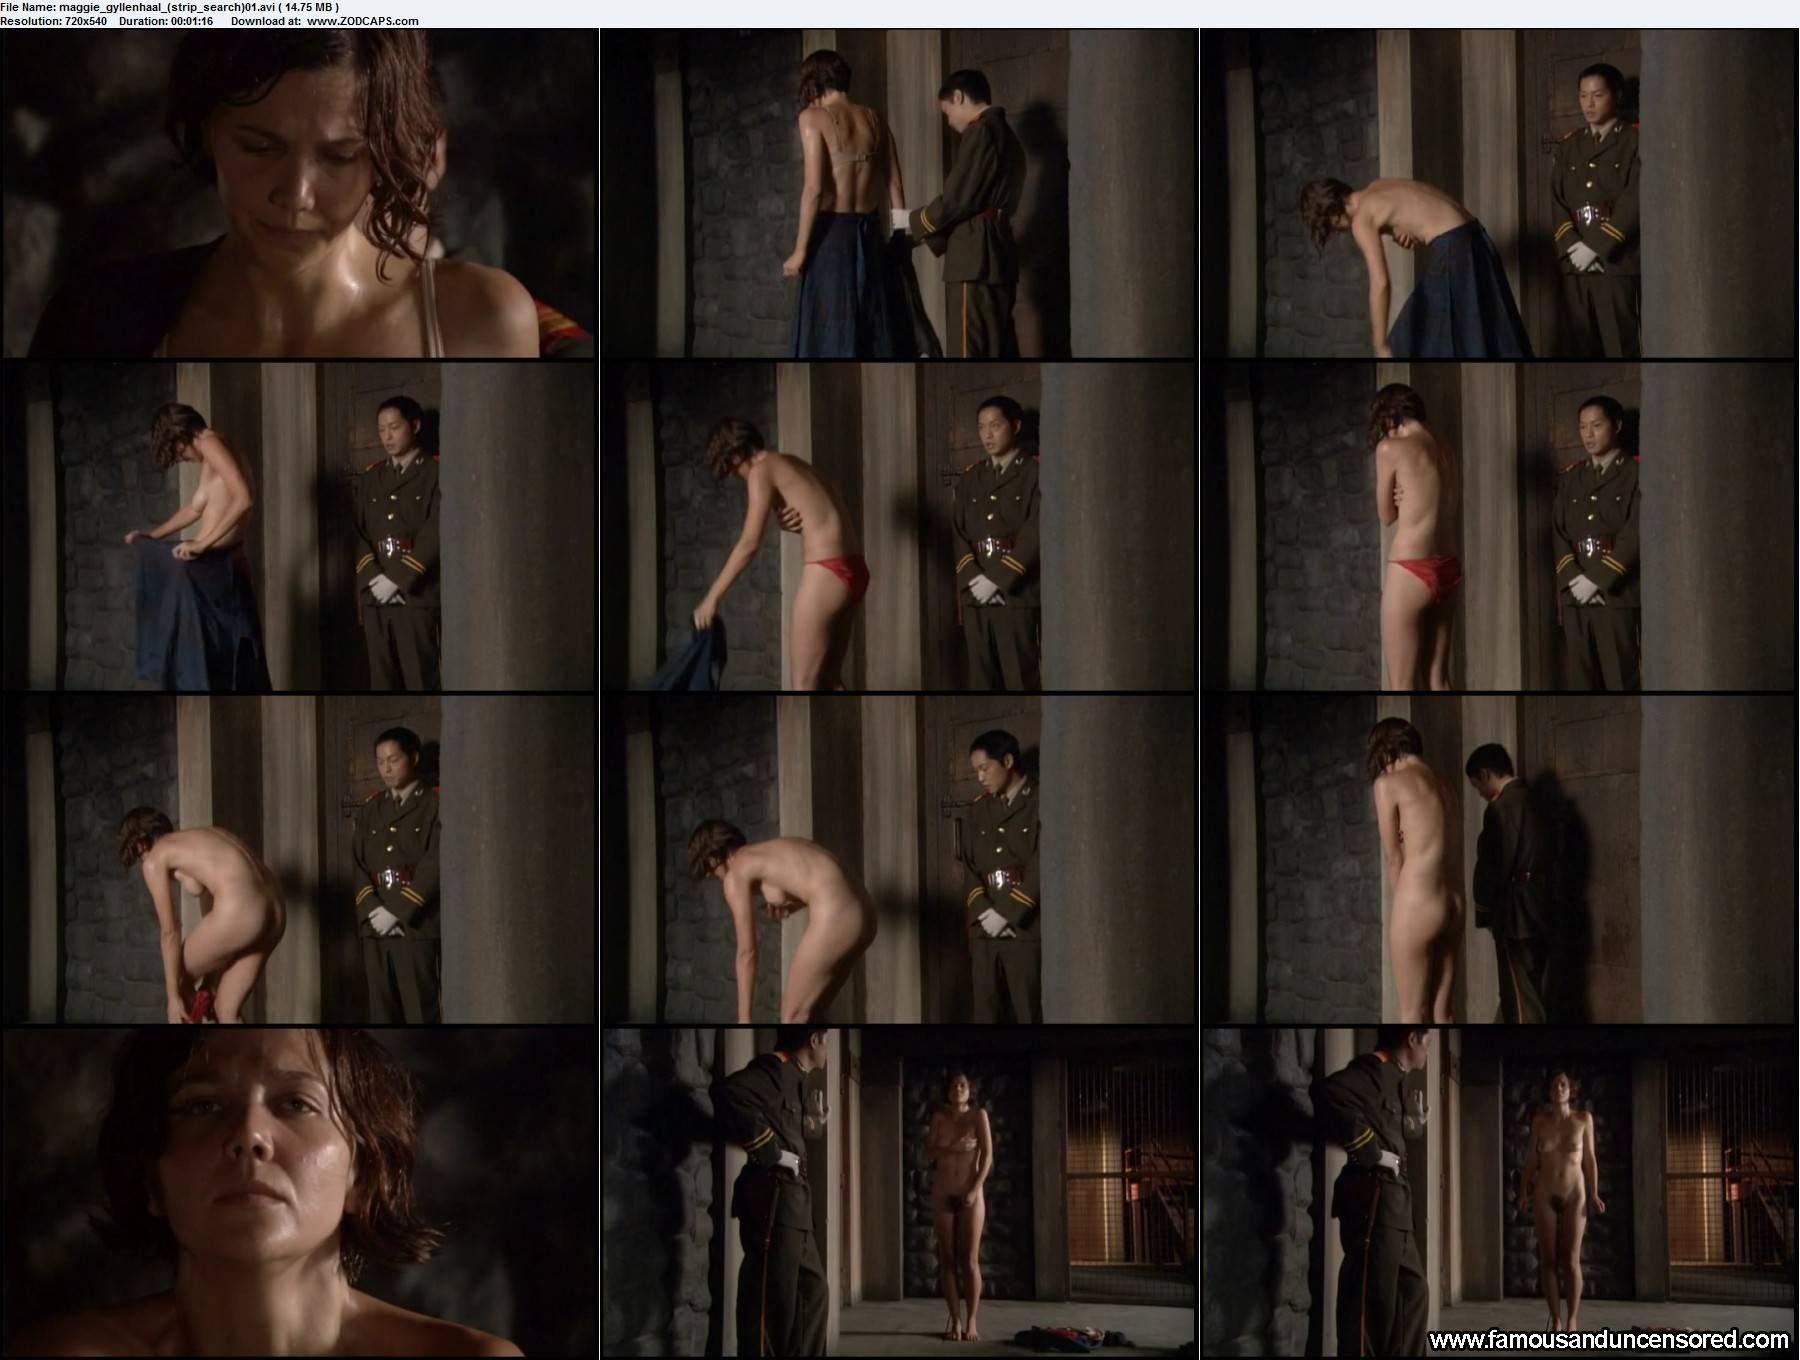 Maggie gyllenhaal strip search